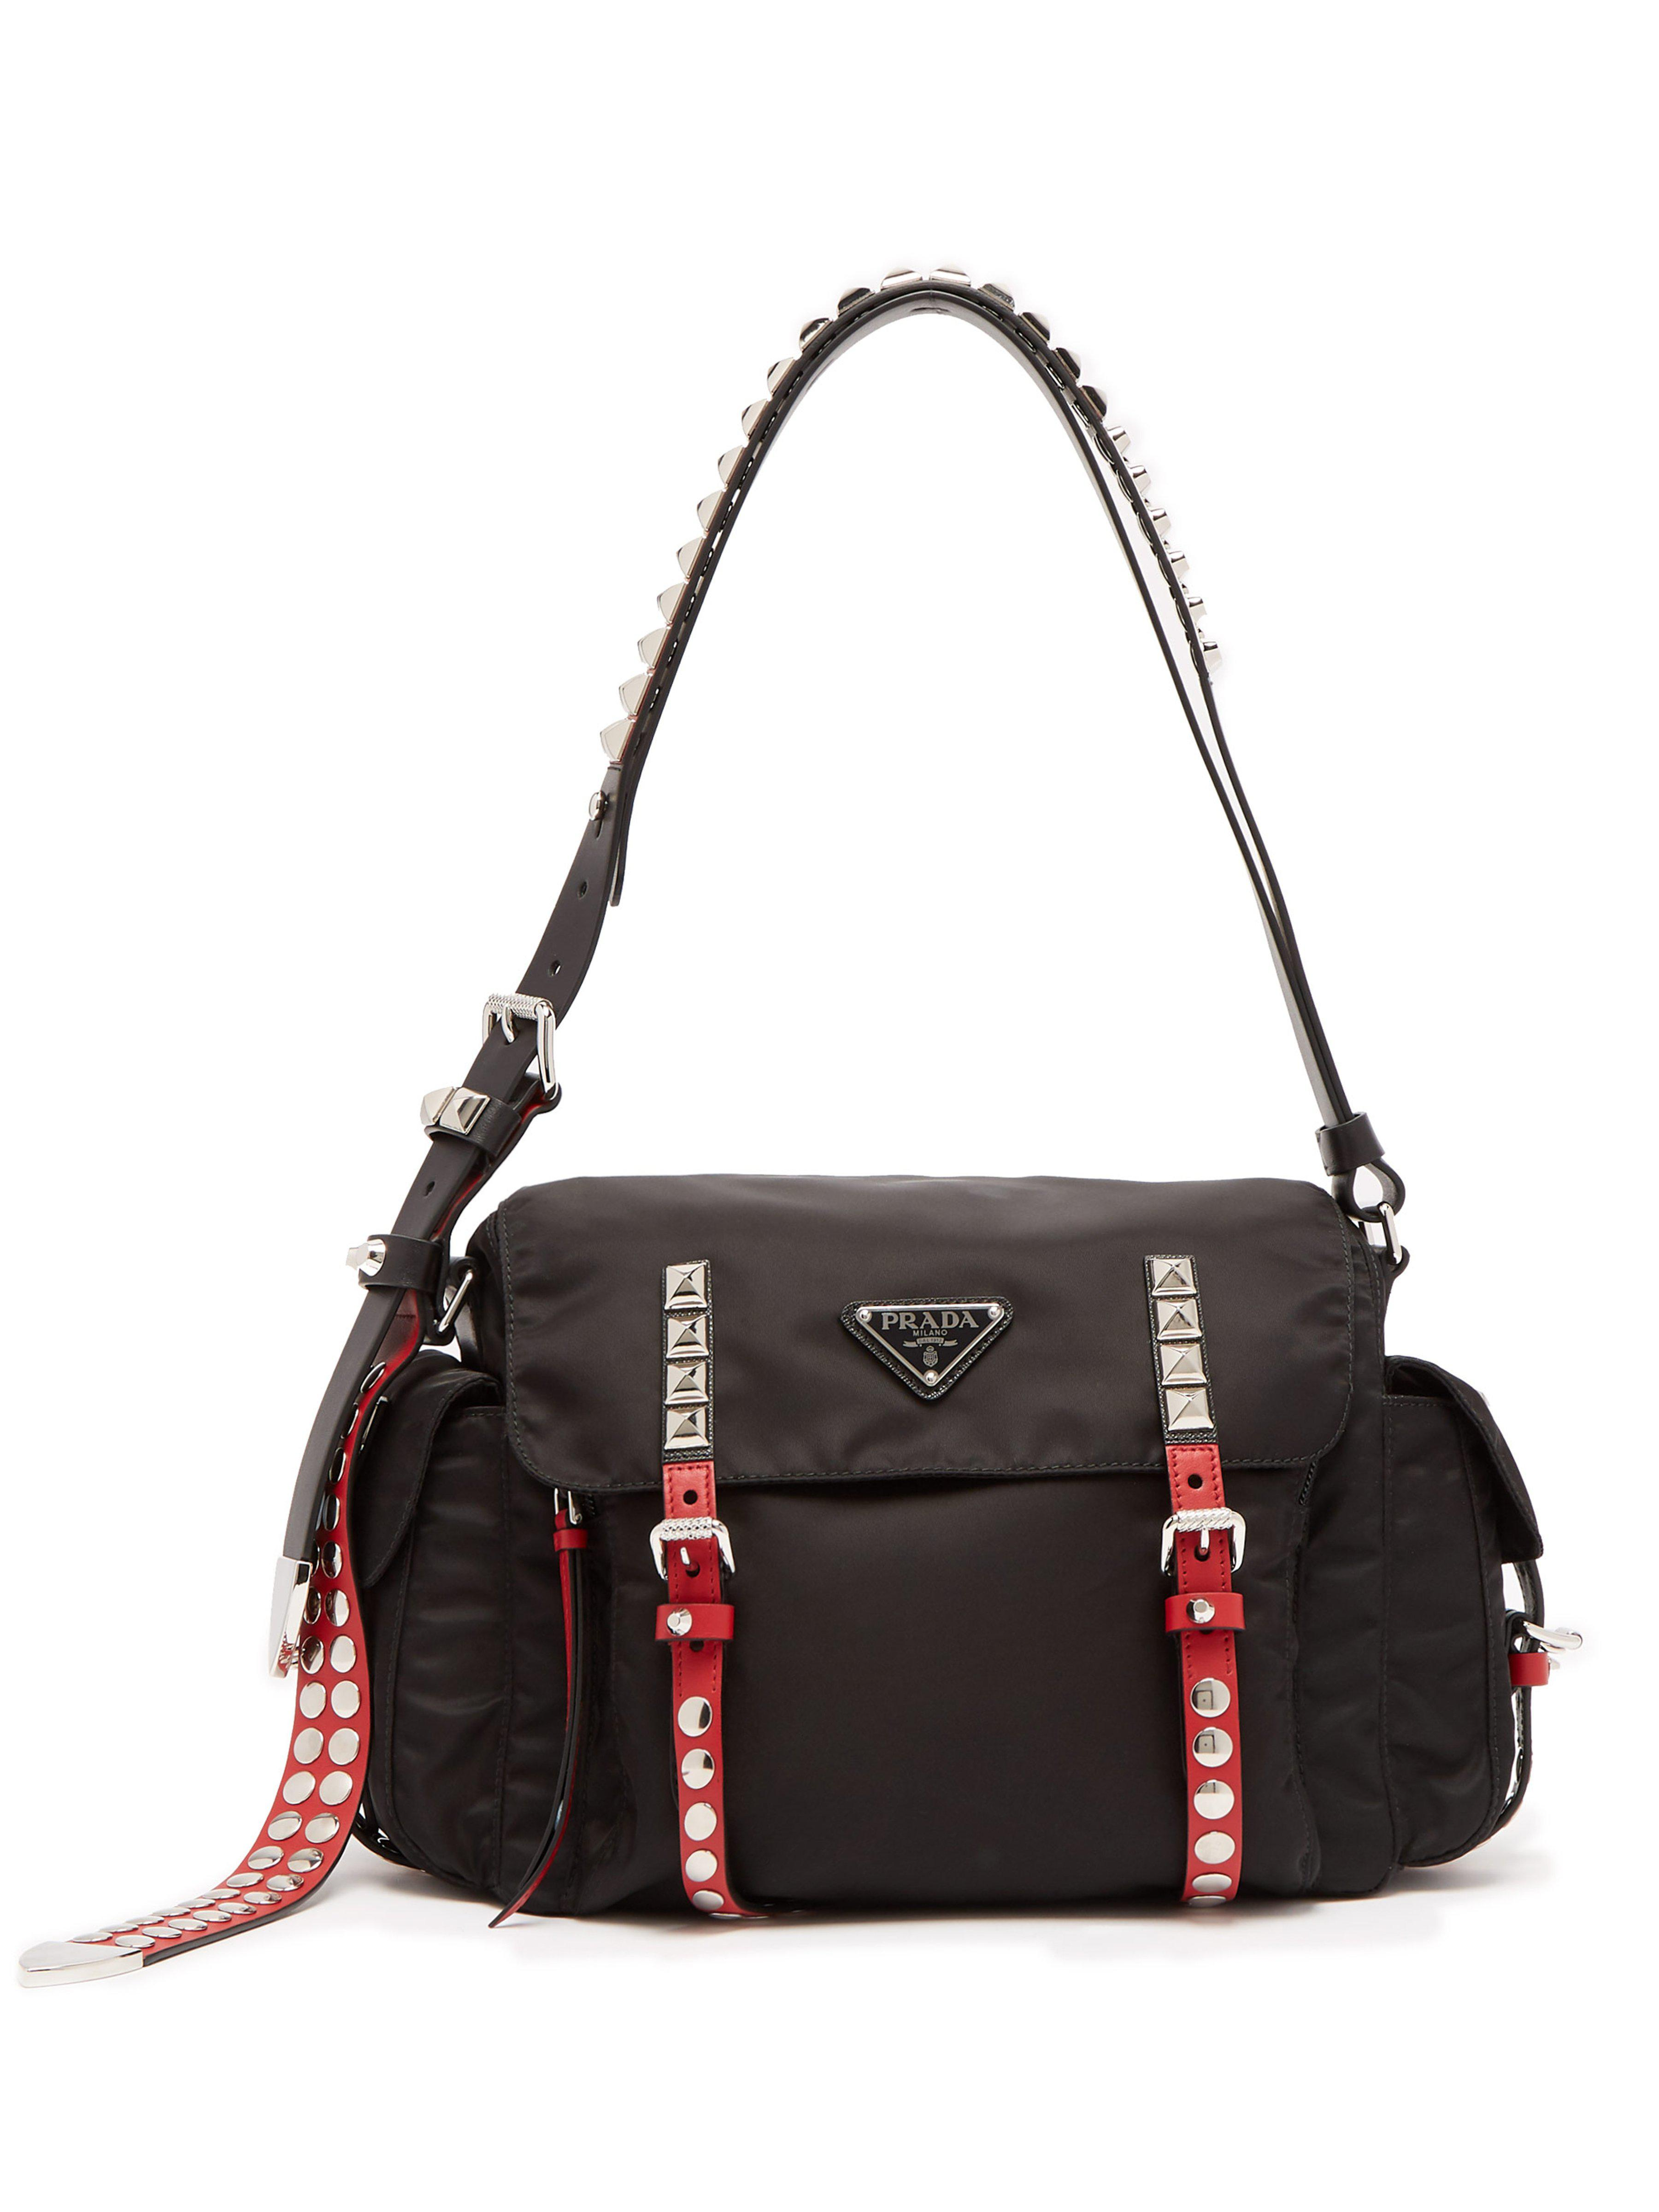 1c902ae93f2d Prada - Black Vela Leather Trimmed Cross Body Bag - Lyst. View fullscreen